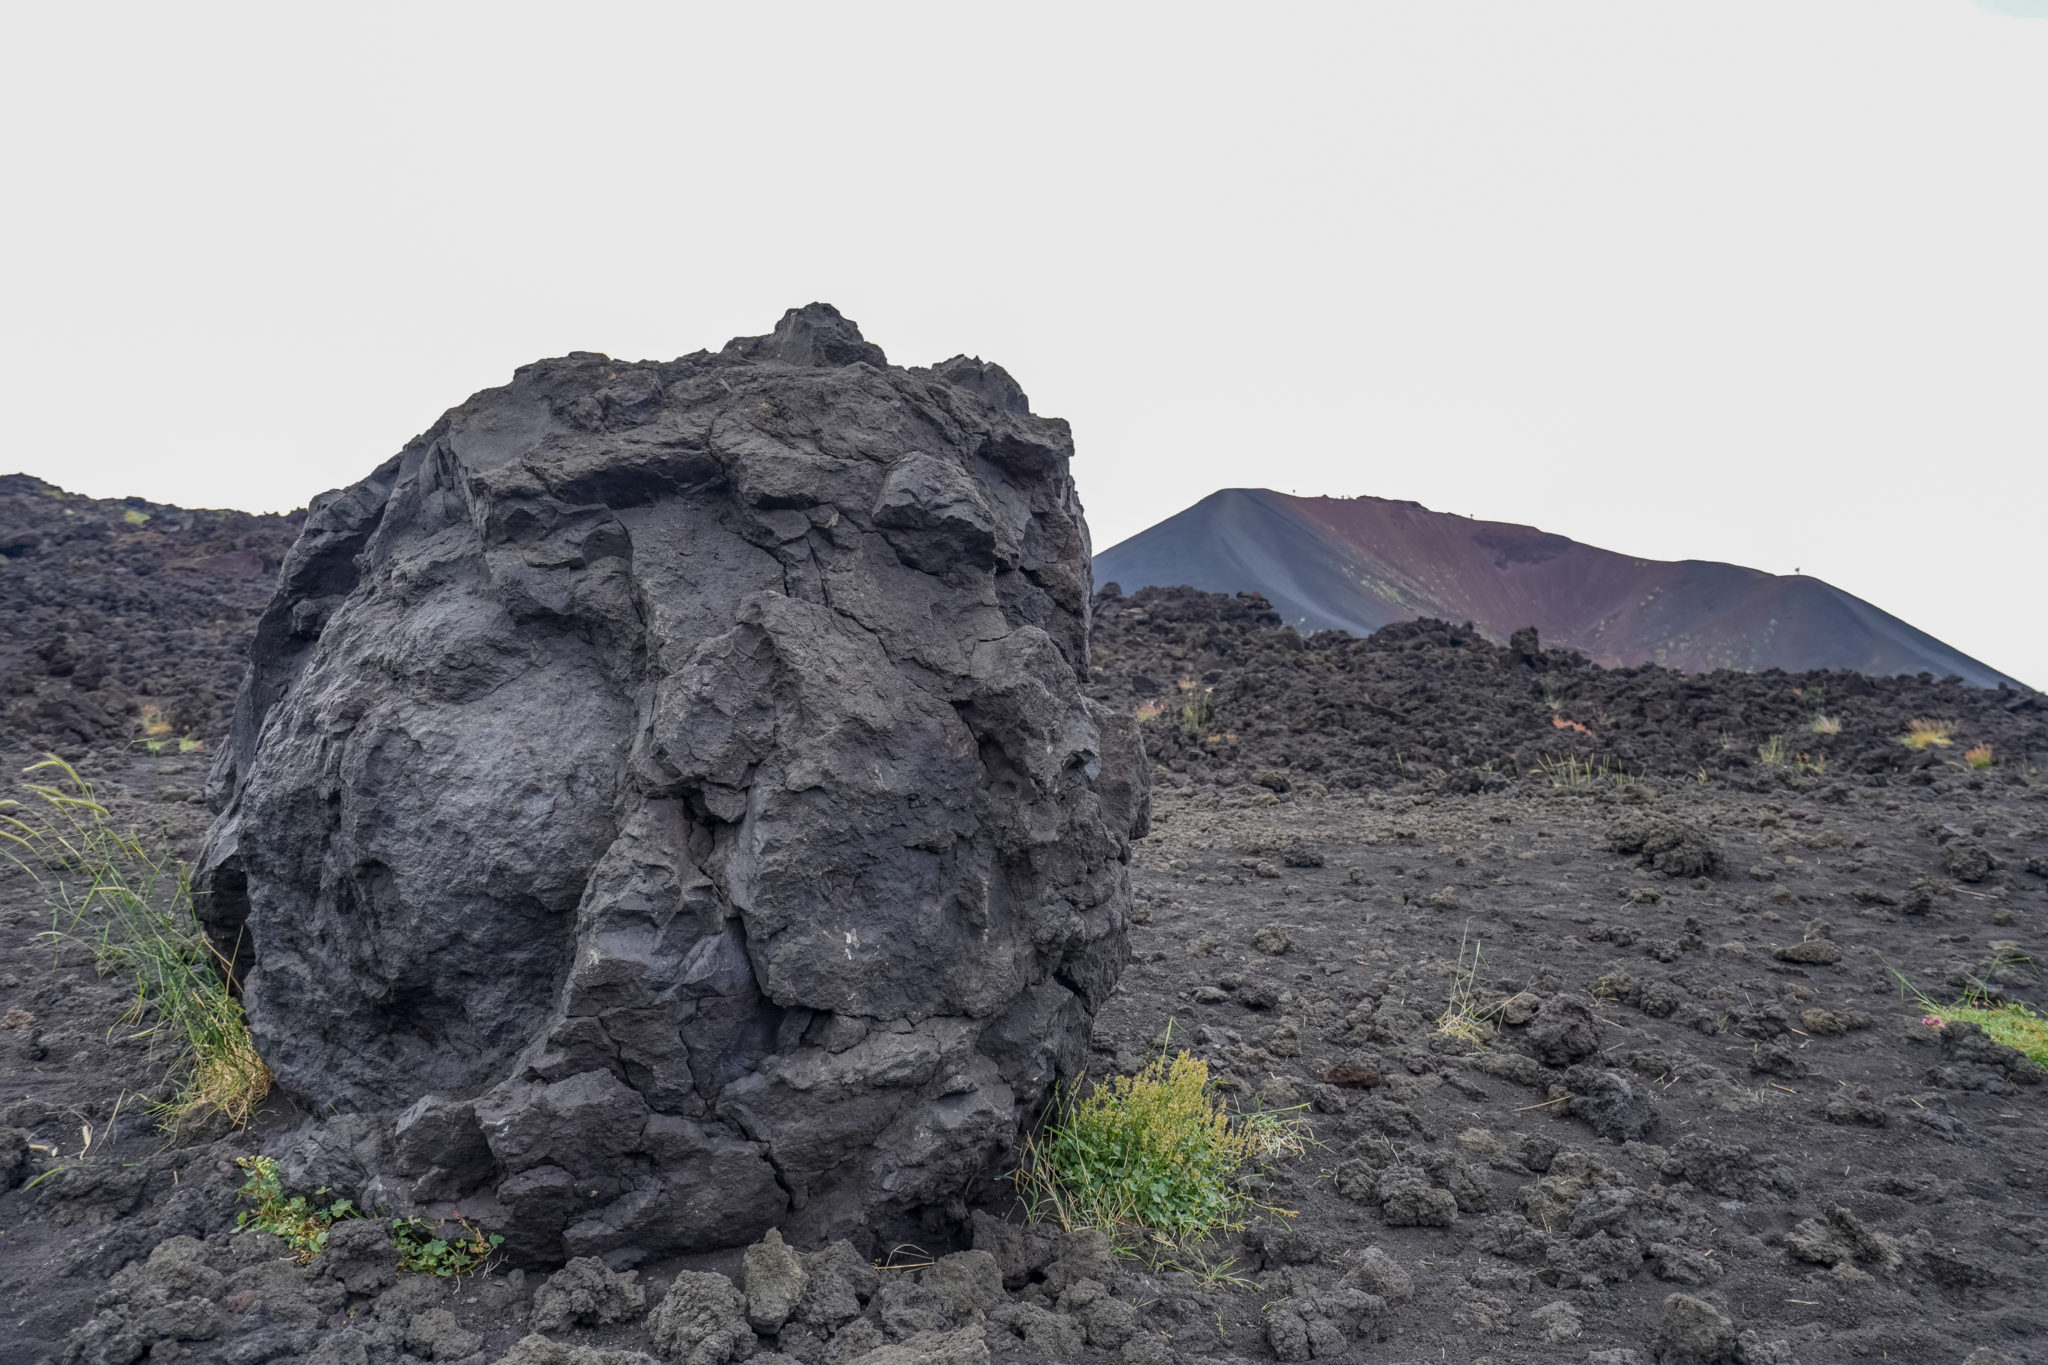 etna-bombe-volcanique-volcan-excursion